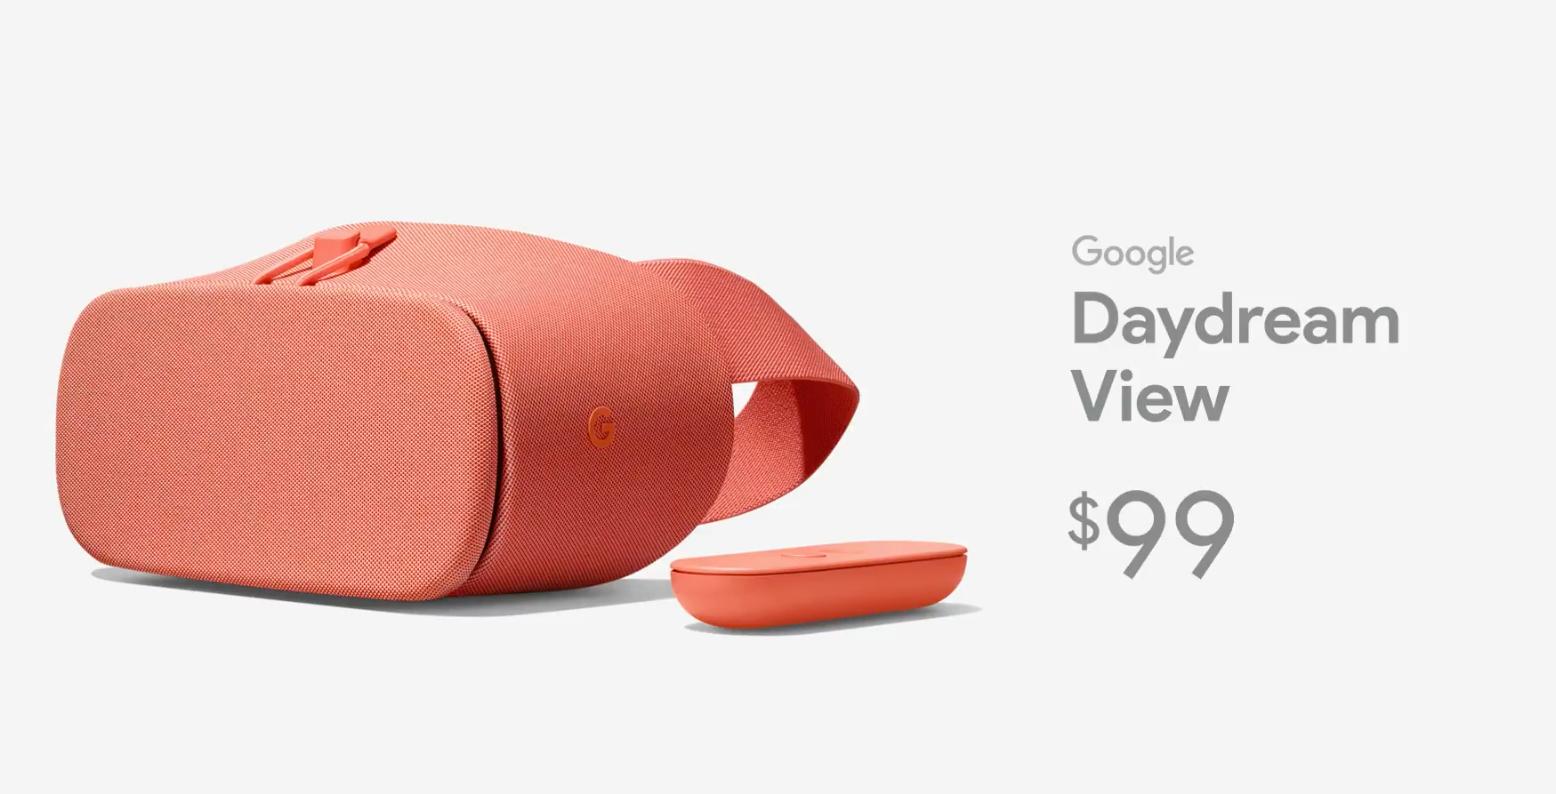 new Google Daydream View